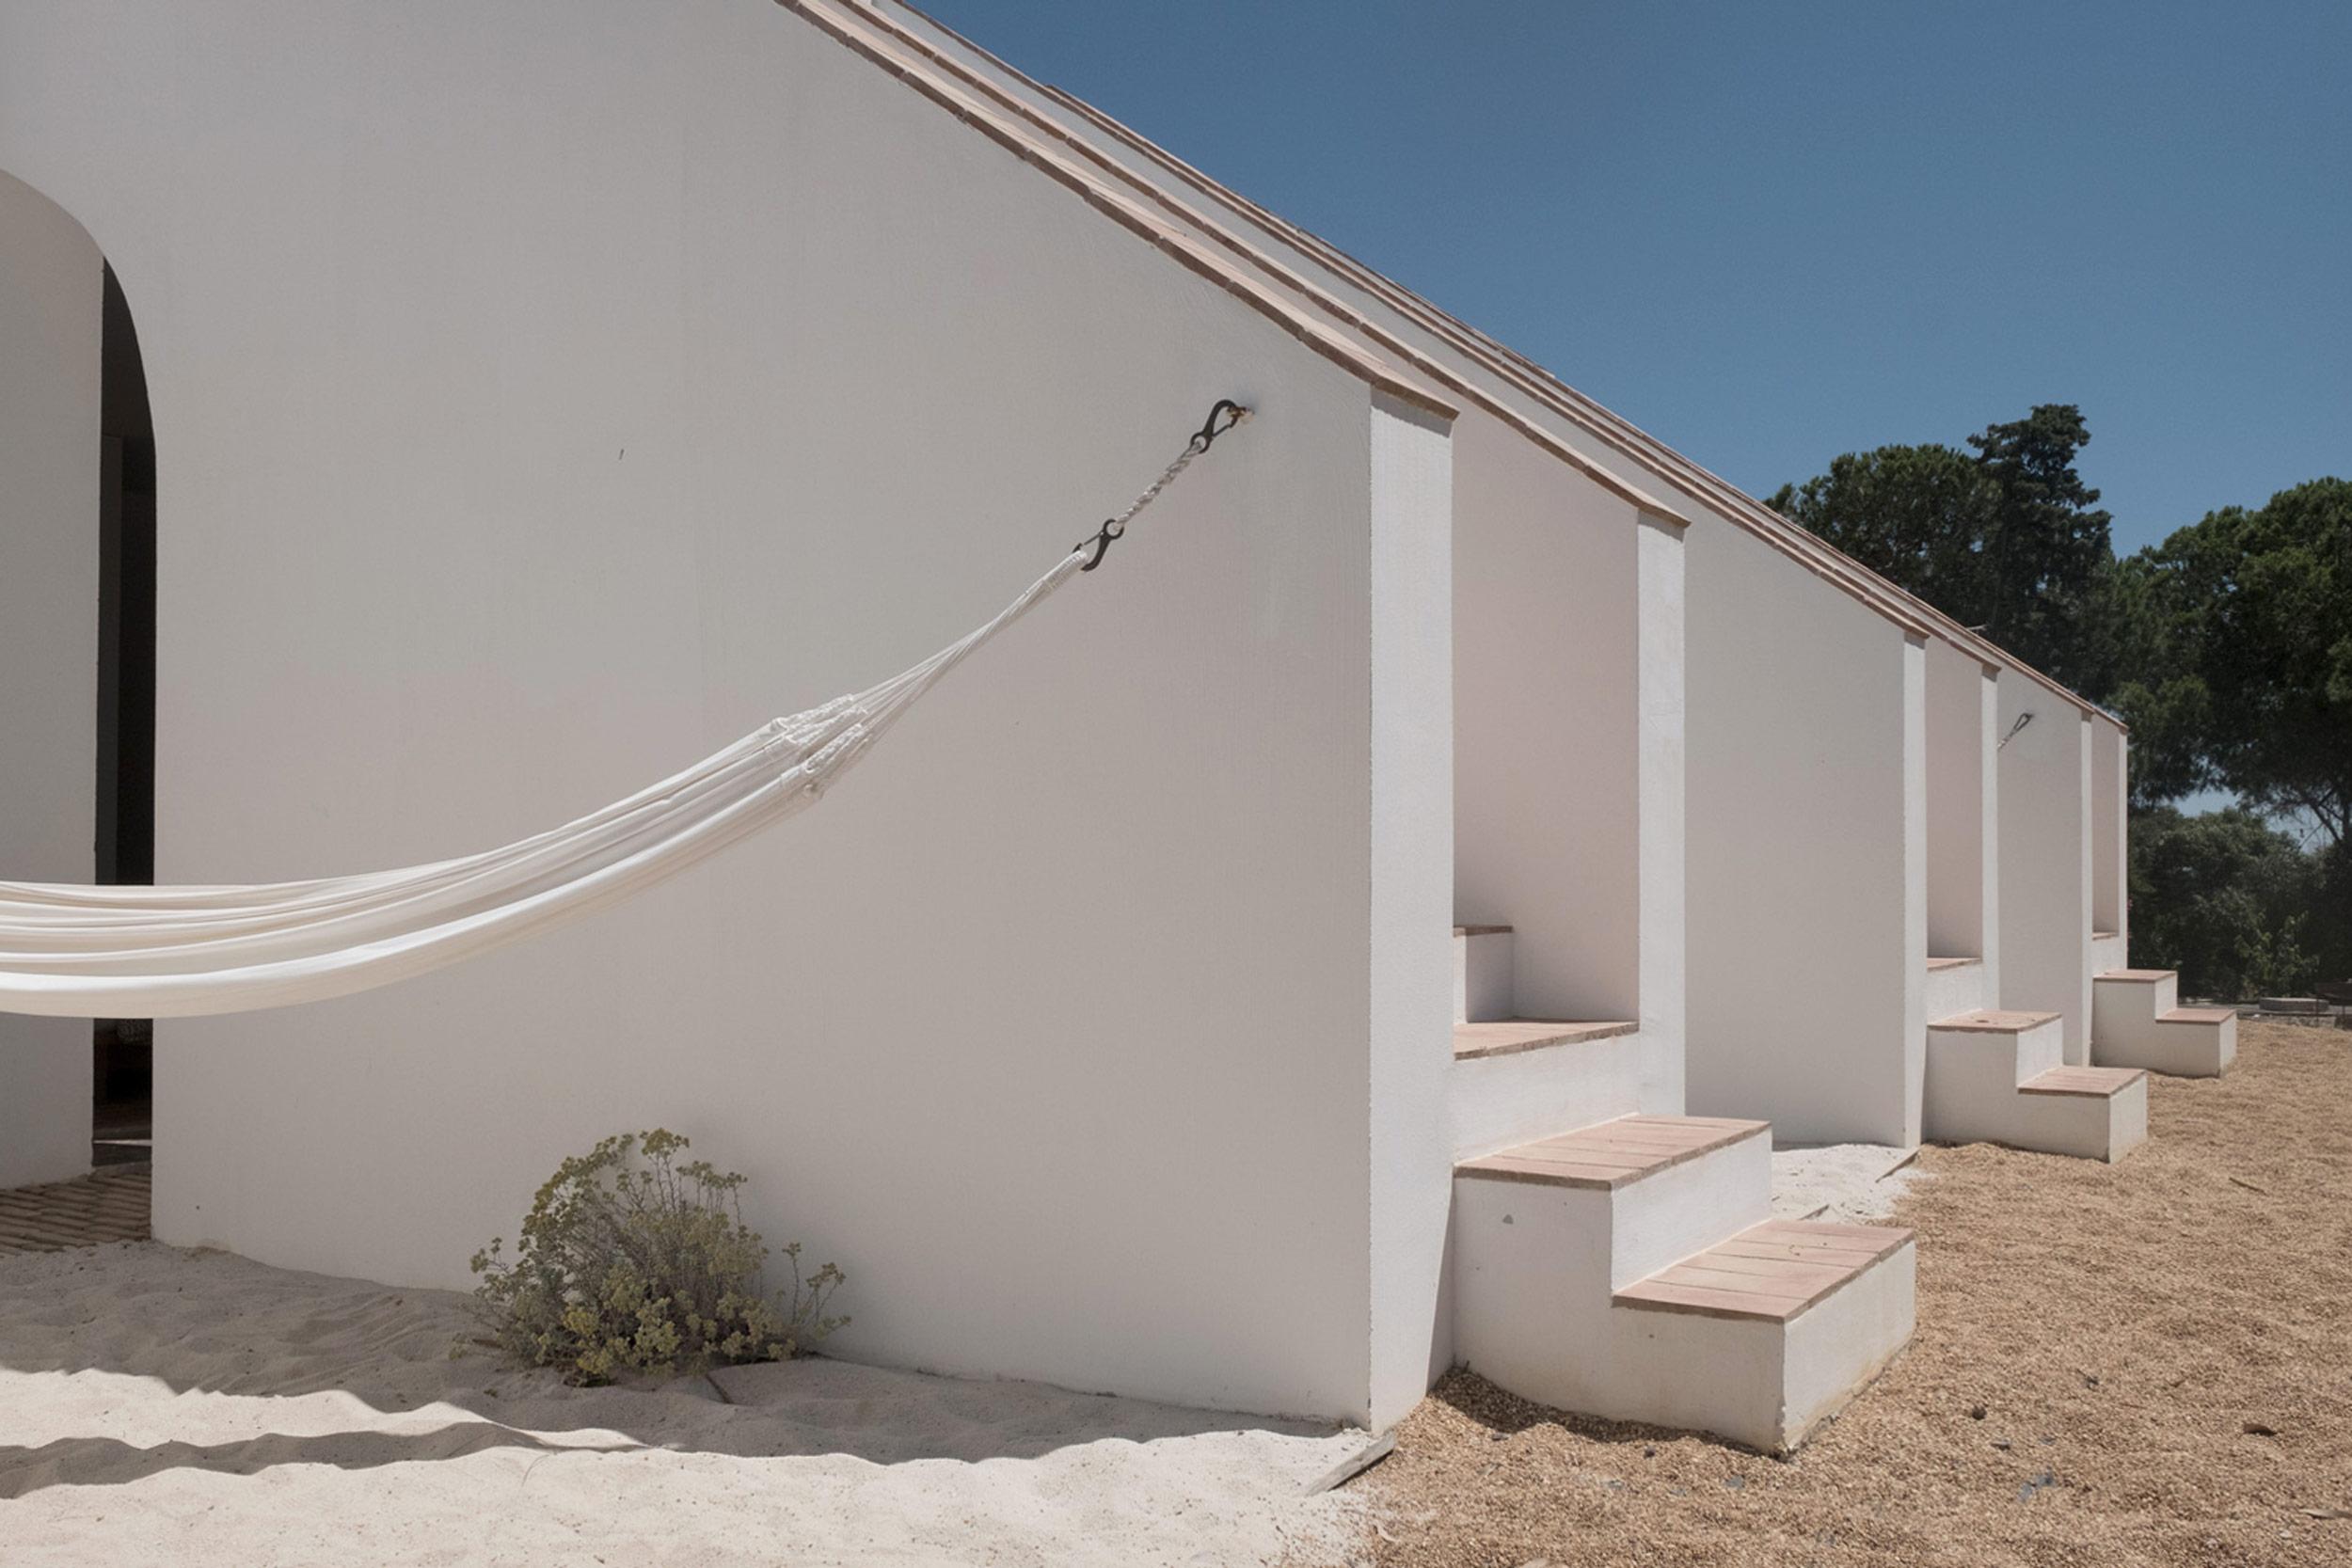 Casa-Modesta-exterior-Fiona-Burrage-hammock.jpg